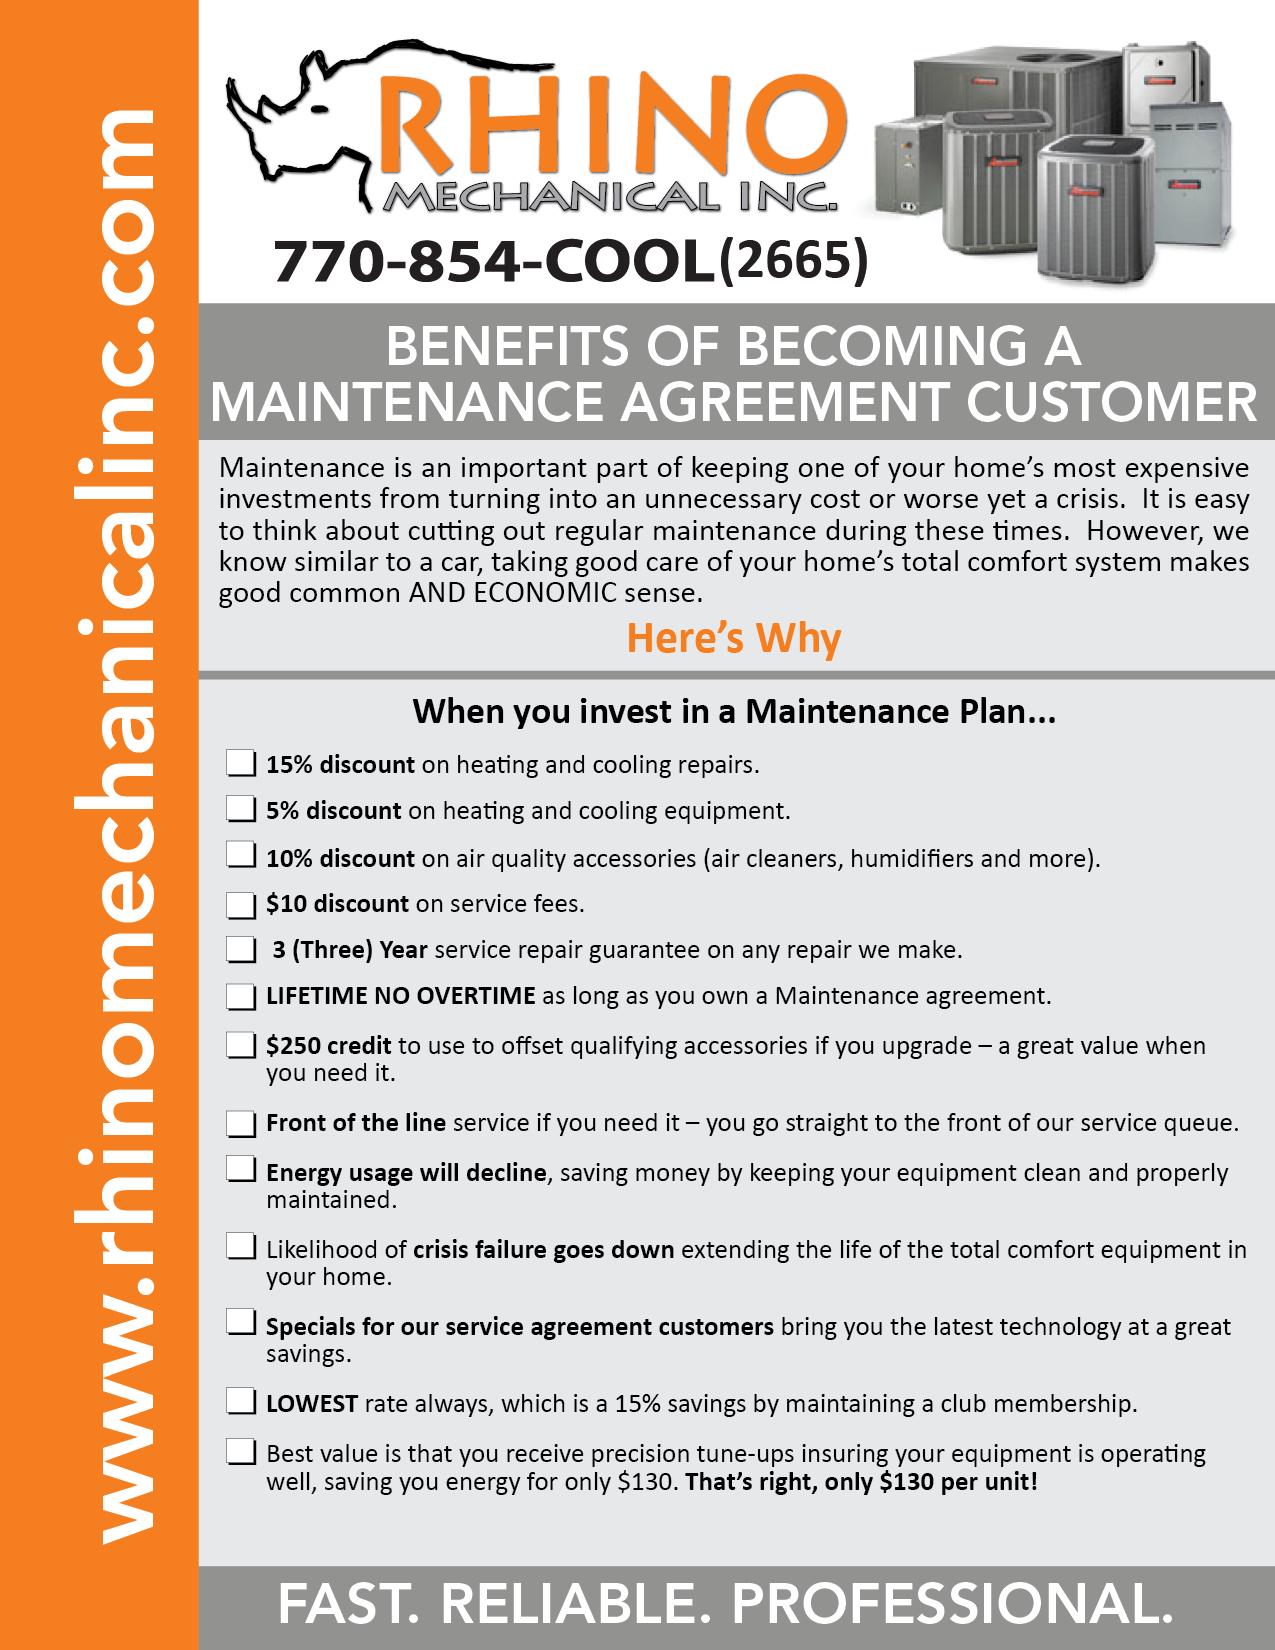 Rhino Mechanical Maintenance Agreement Flyers NEW 2018-01